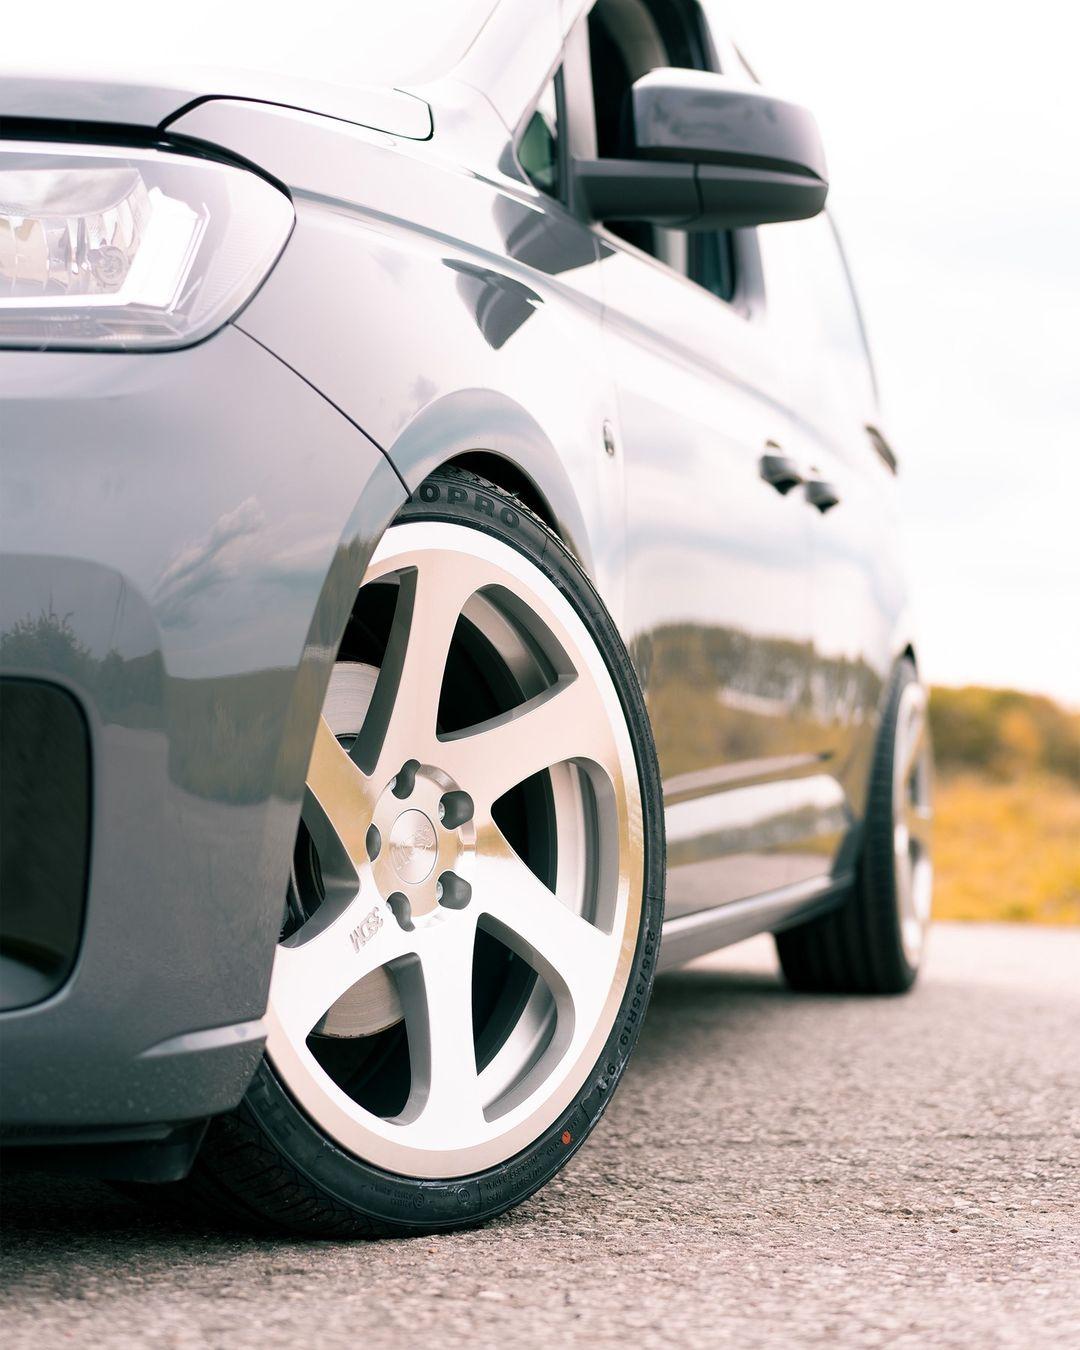 3SDM 0.06 x VW Caddy⠀⠀⠀⠀